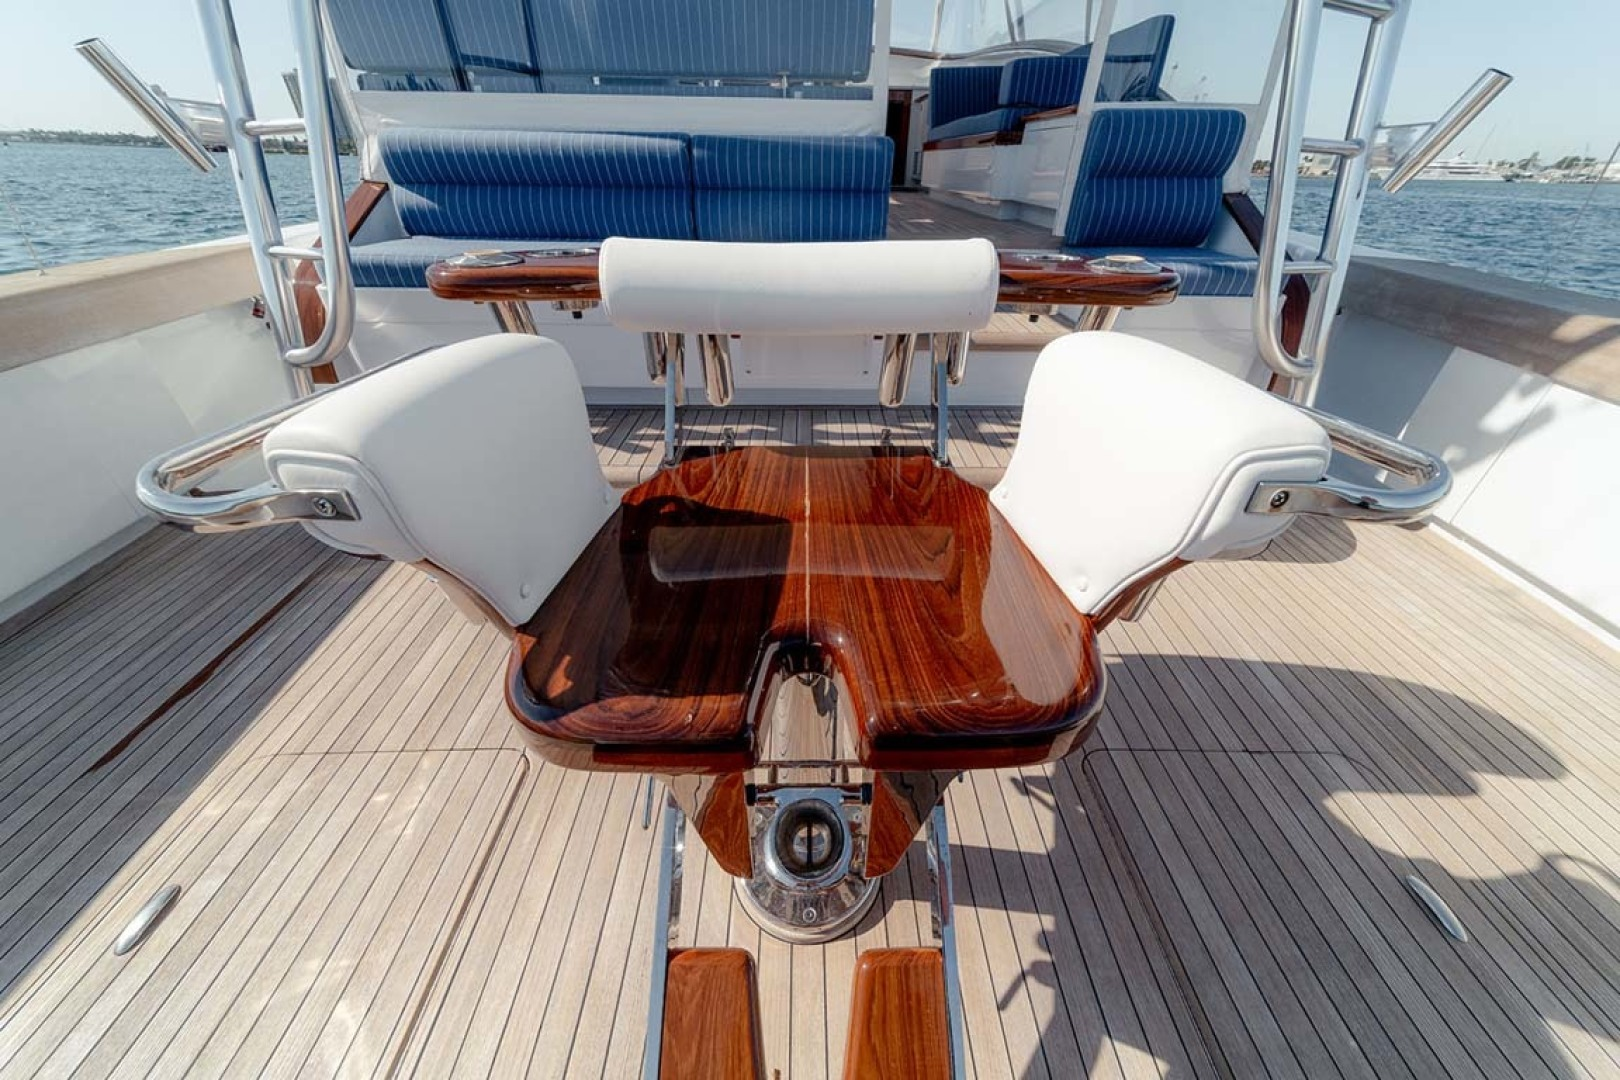 Jim Smith-Walkaround Express 2018-Eurybia North Palm Beach-Florida-United States-Bluewater Marlin Chair-1573753   Thumbnail